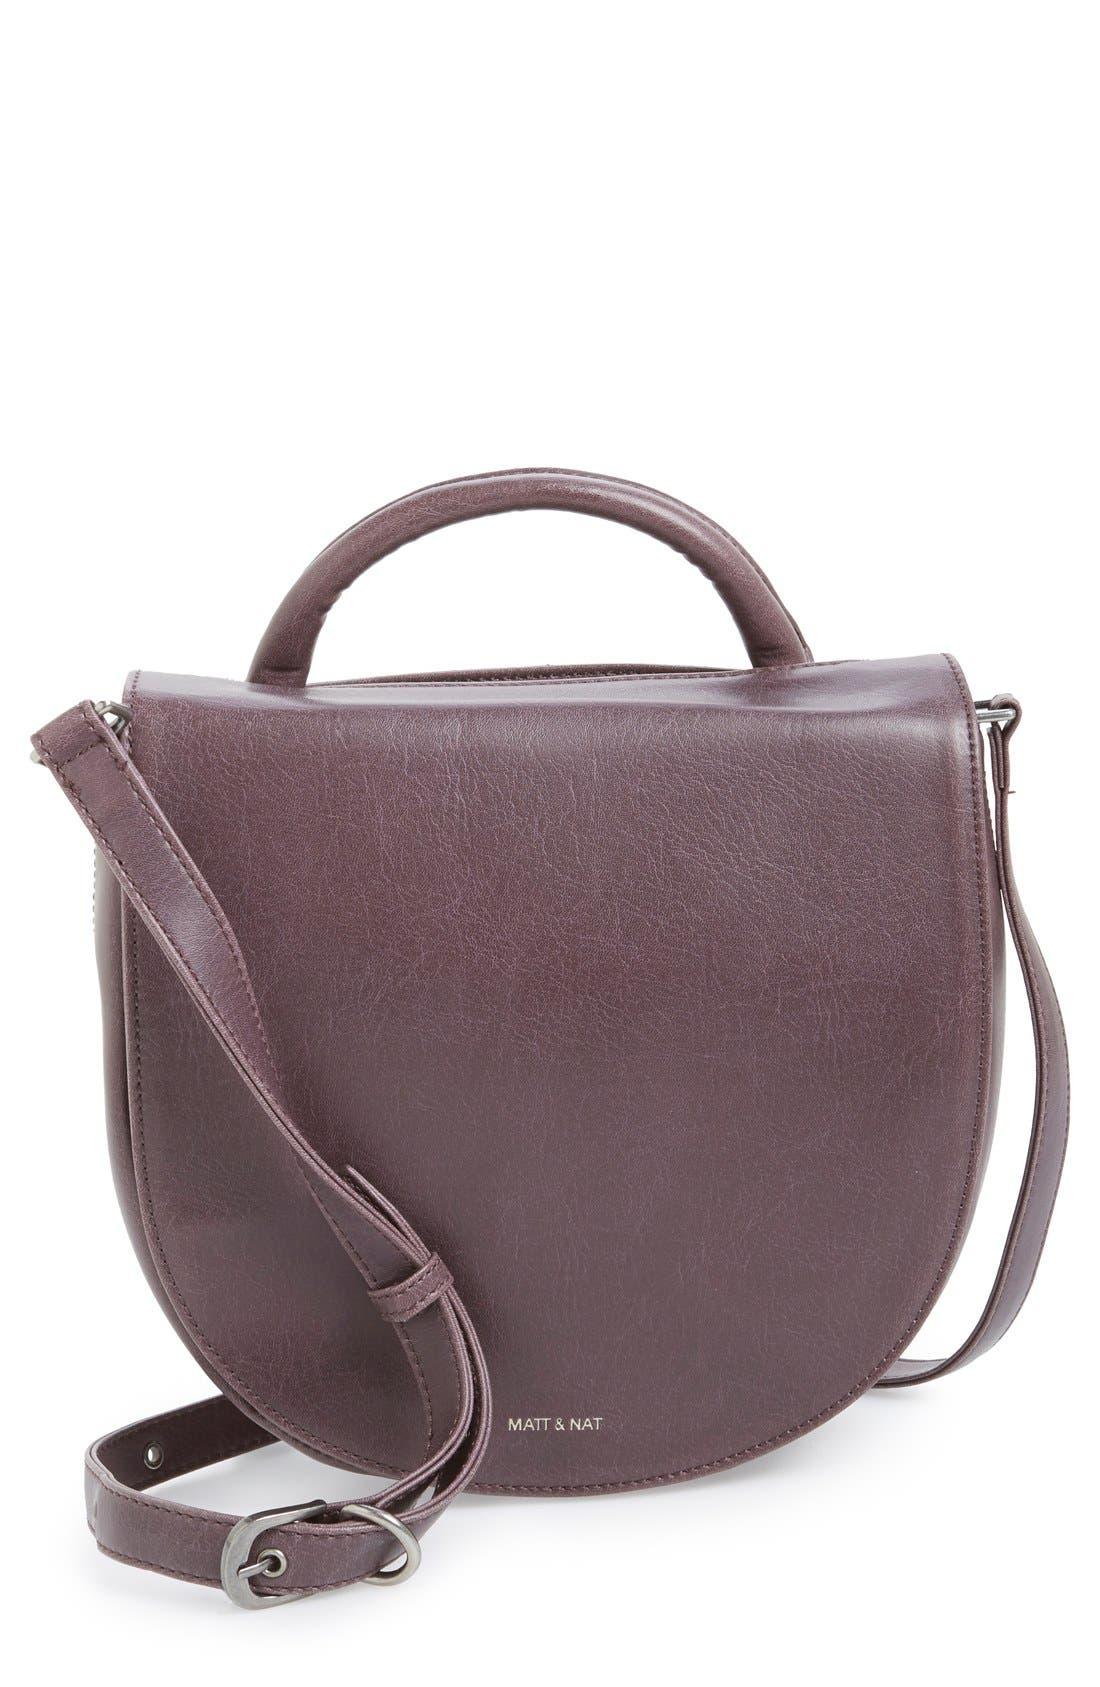 Alternate Image 1 Selected - Matt & Nat 'Parabole' Vegan Leather Crossbody Bag